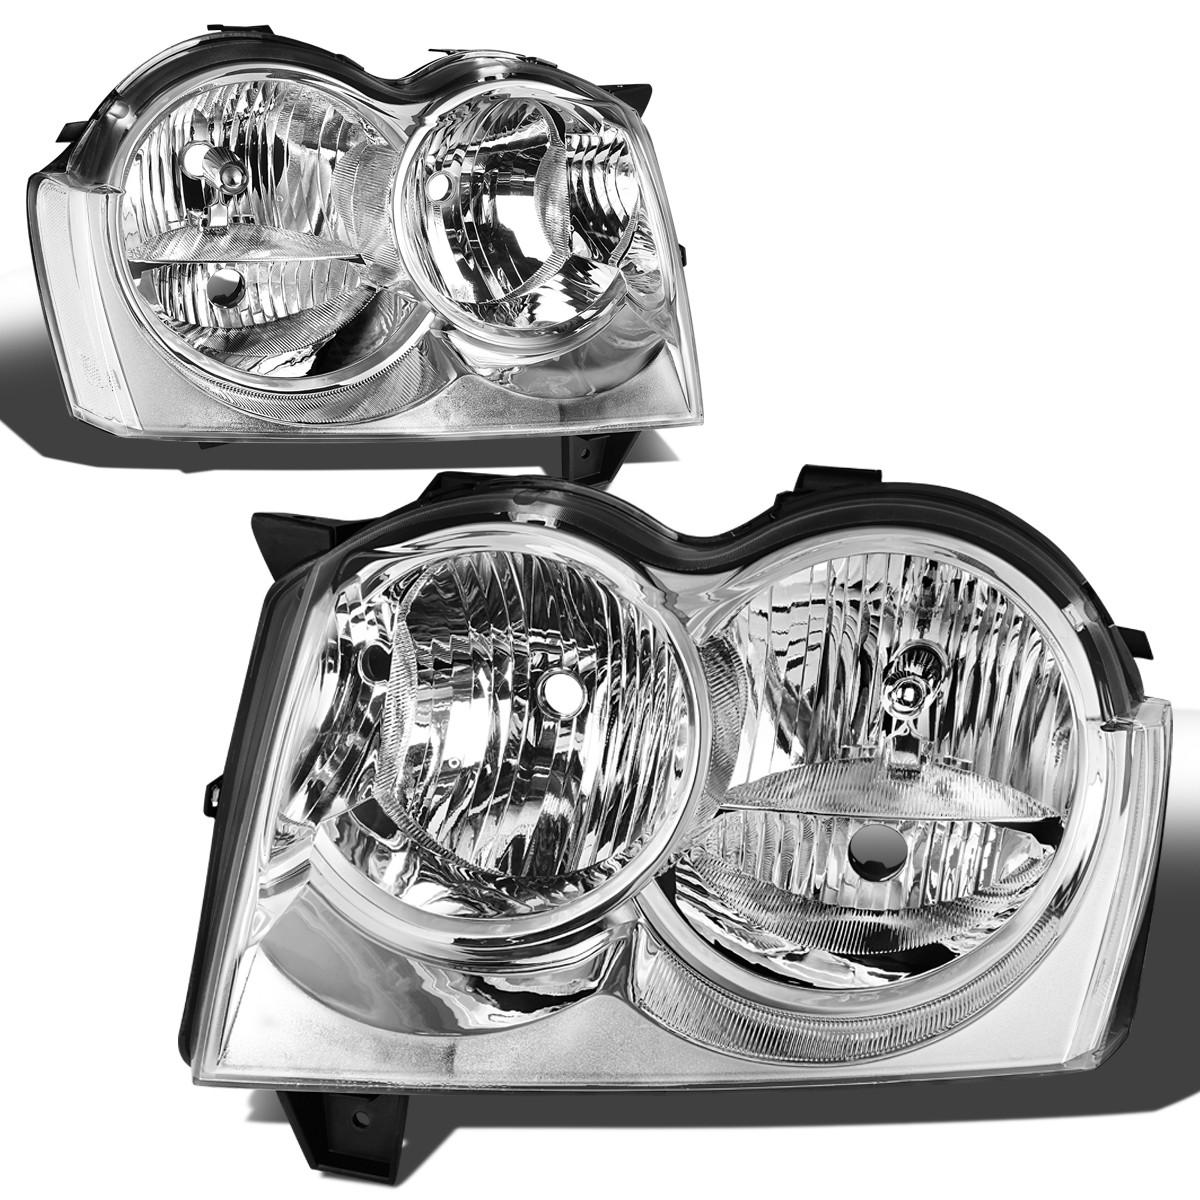 For 2005 2007 Jeep Grand Cherokee WK 3rd Gen Chrome Housing Clear Corner Headlights Lamp